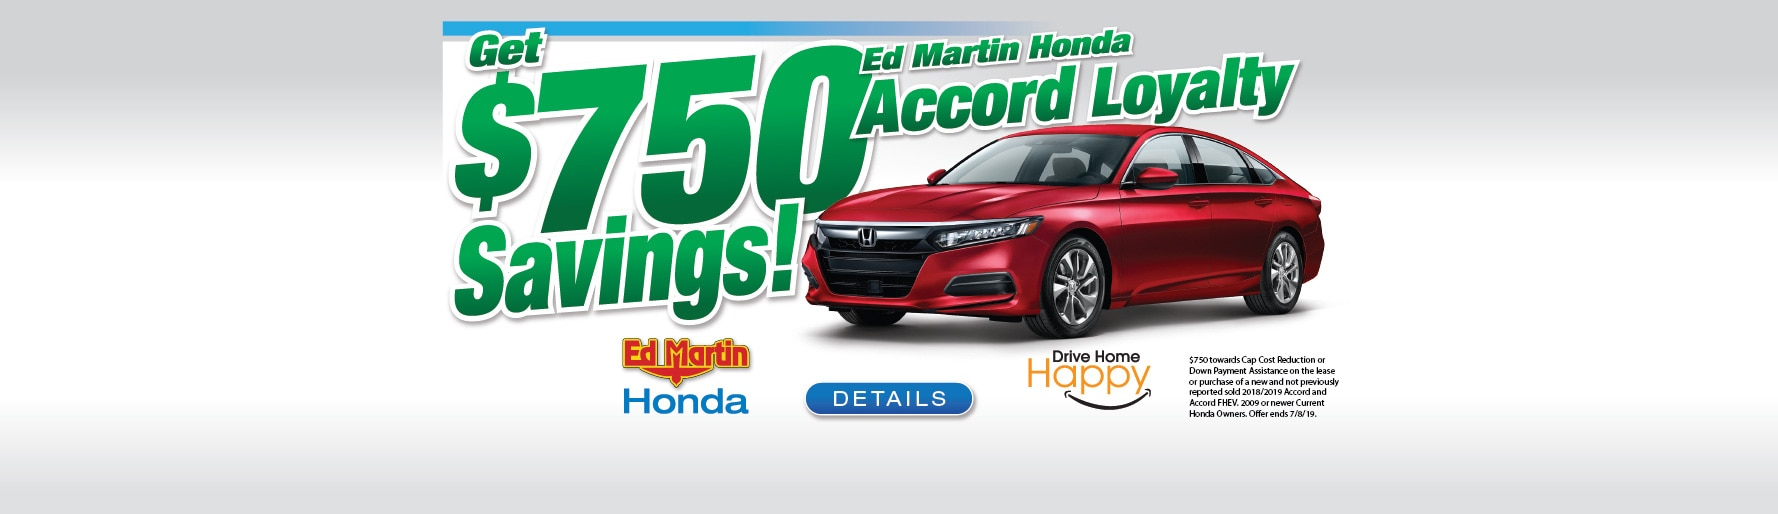 Honda Dealership Indianapolis >> Indianapolis S Ed Martin Honda New And Used Honda Cars